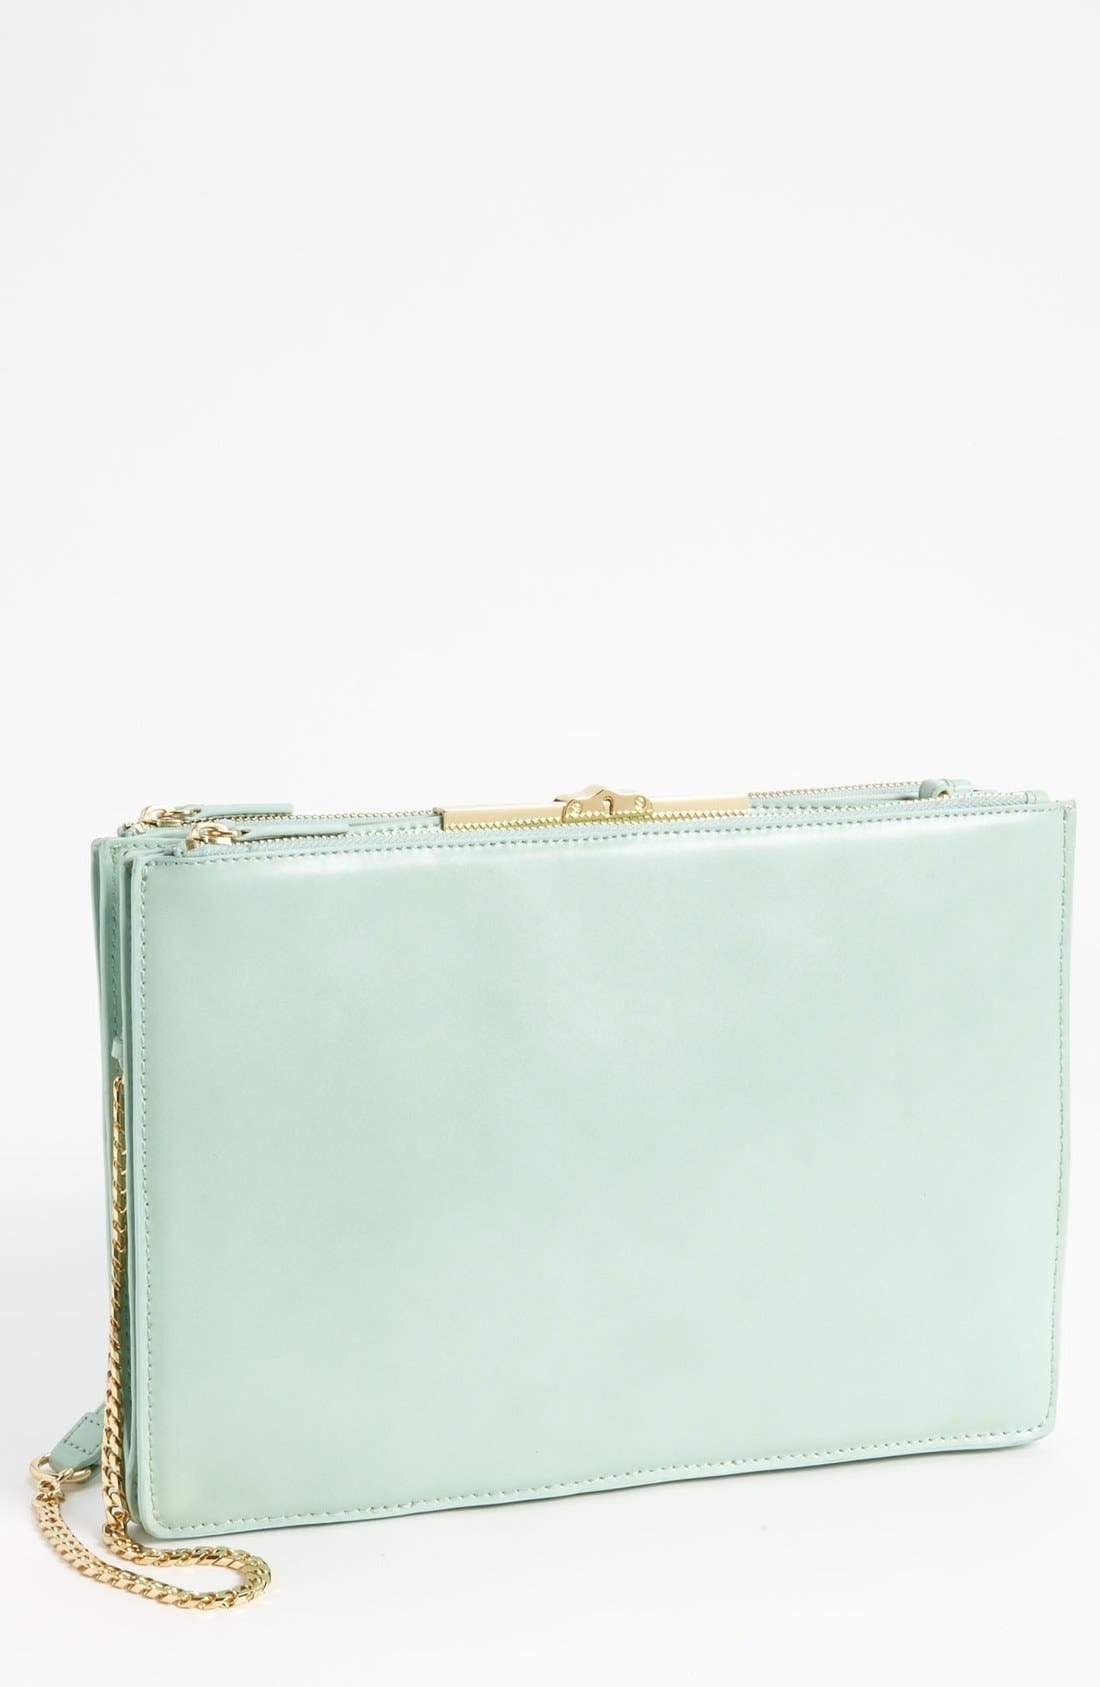 Main Image - Vince Camuto 'Clara' Shoulder Bag